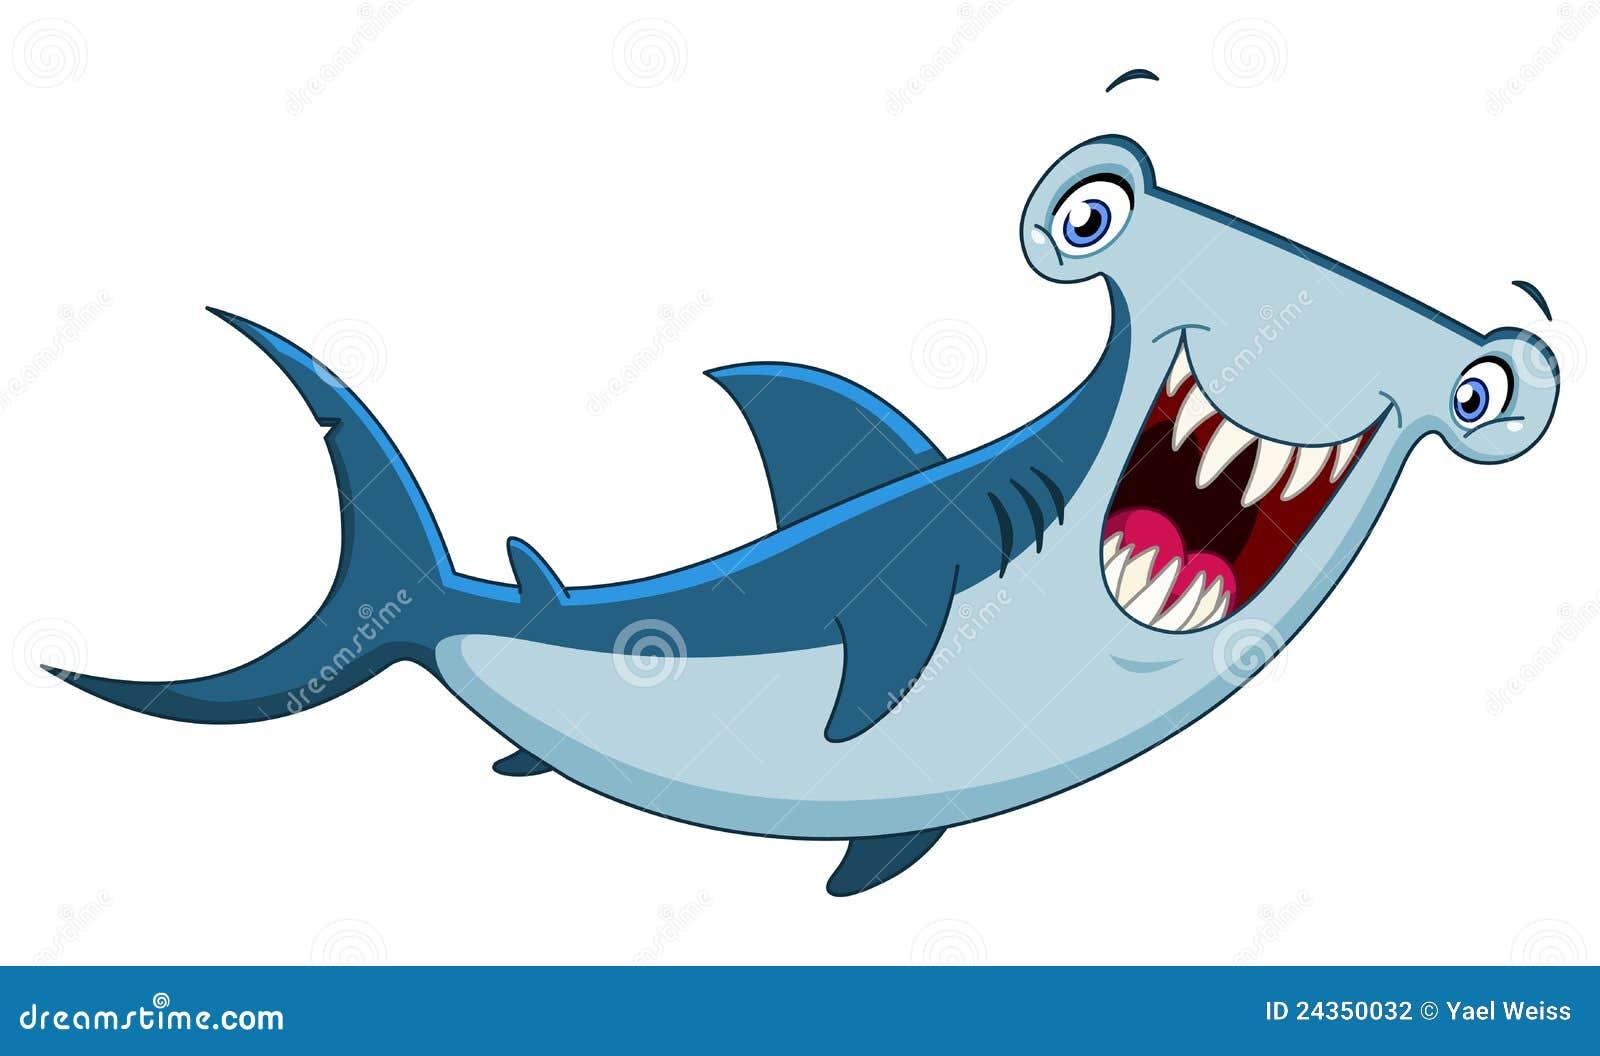 hammerhead shark stock photography image 24350032 fish bowl clip art free fish bowl clip art template